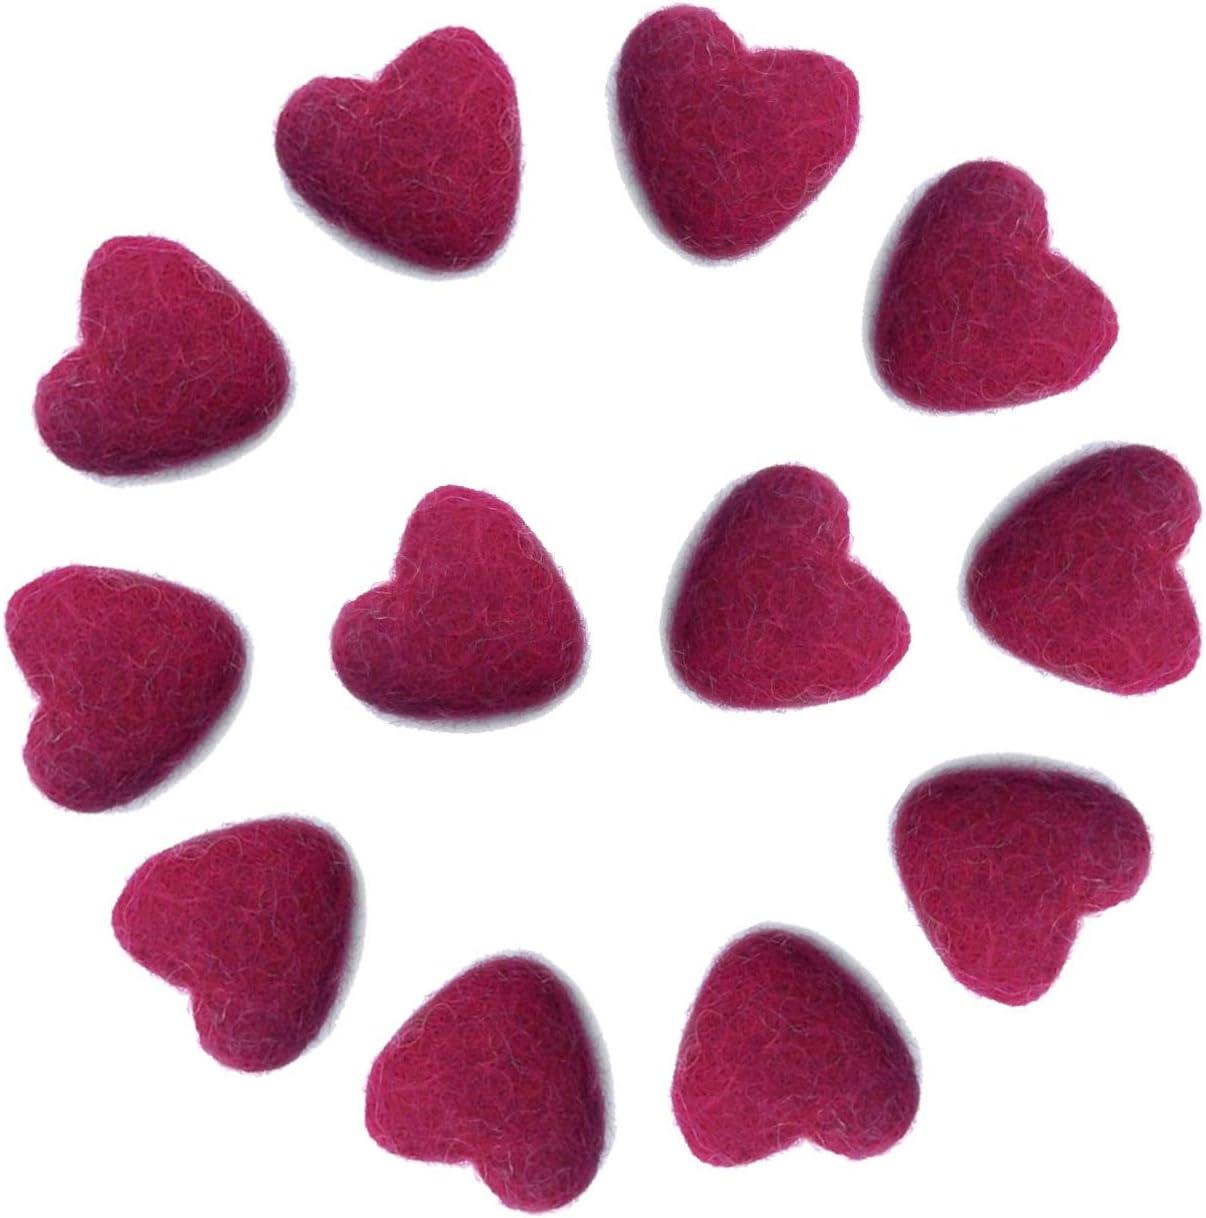 3cm 30mm Heart Shape Wool Felt Balls Beads 100% Natural Wool Felting Woolen Felted Fabric for Home Decor Dream Catcher DIY Baby-Mobile Garland Crafts Handcrafts Project DIY (Wine Red 12pcs)